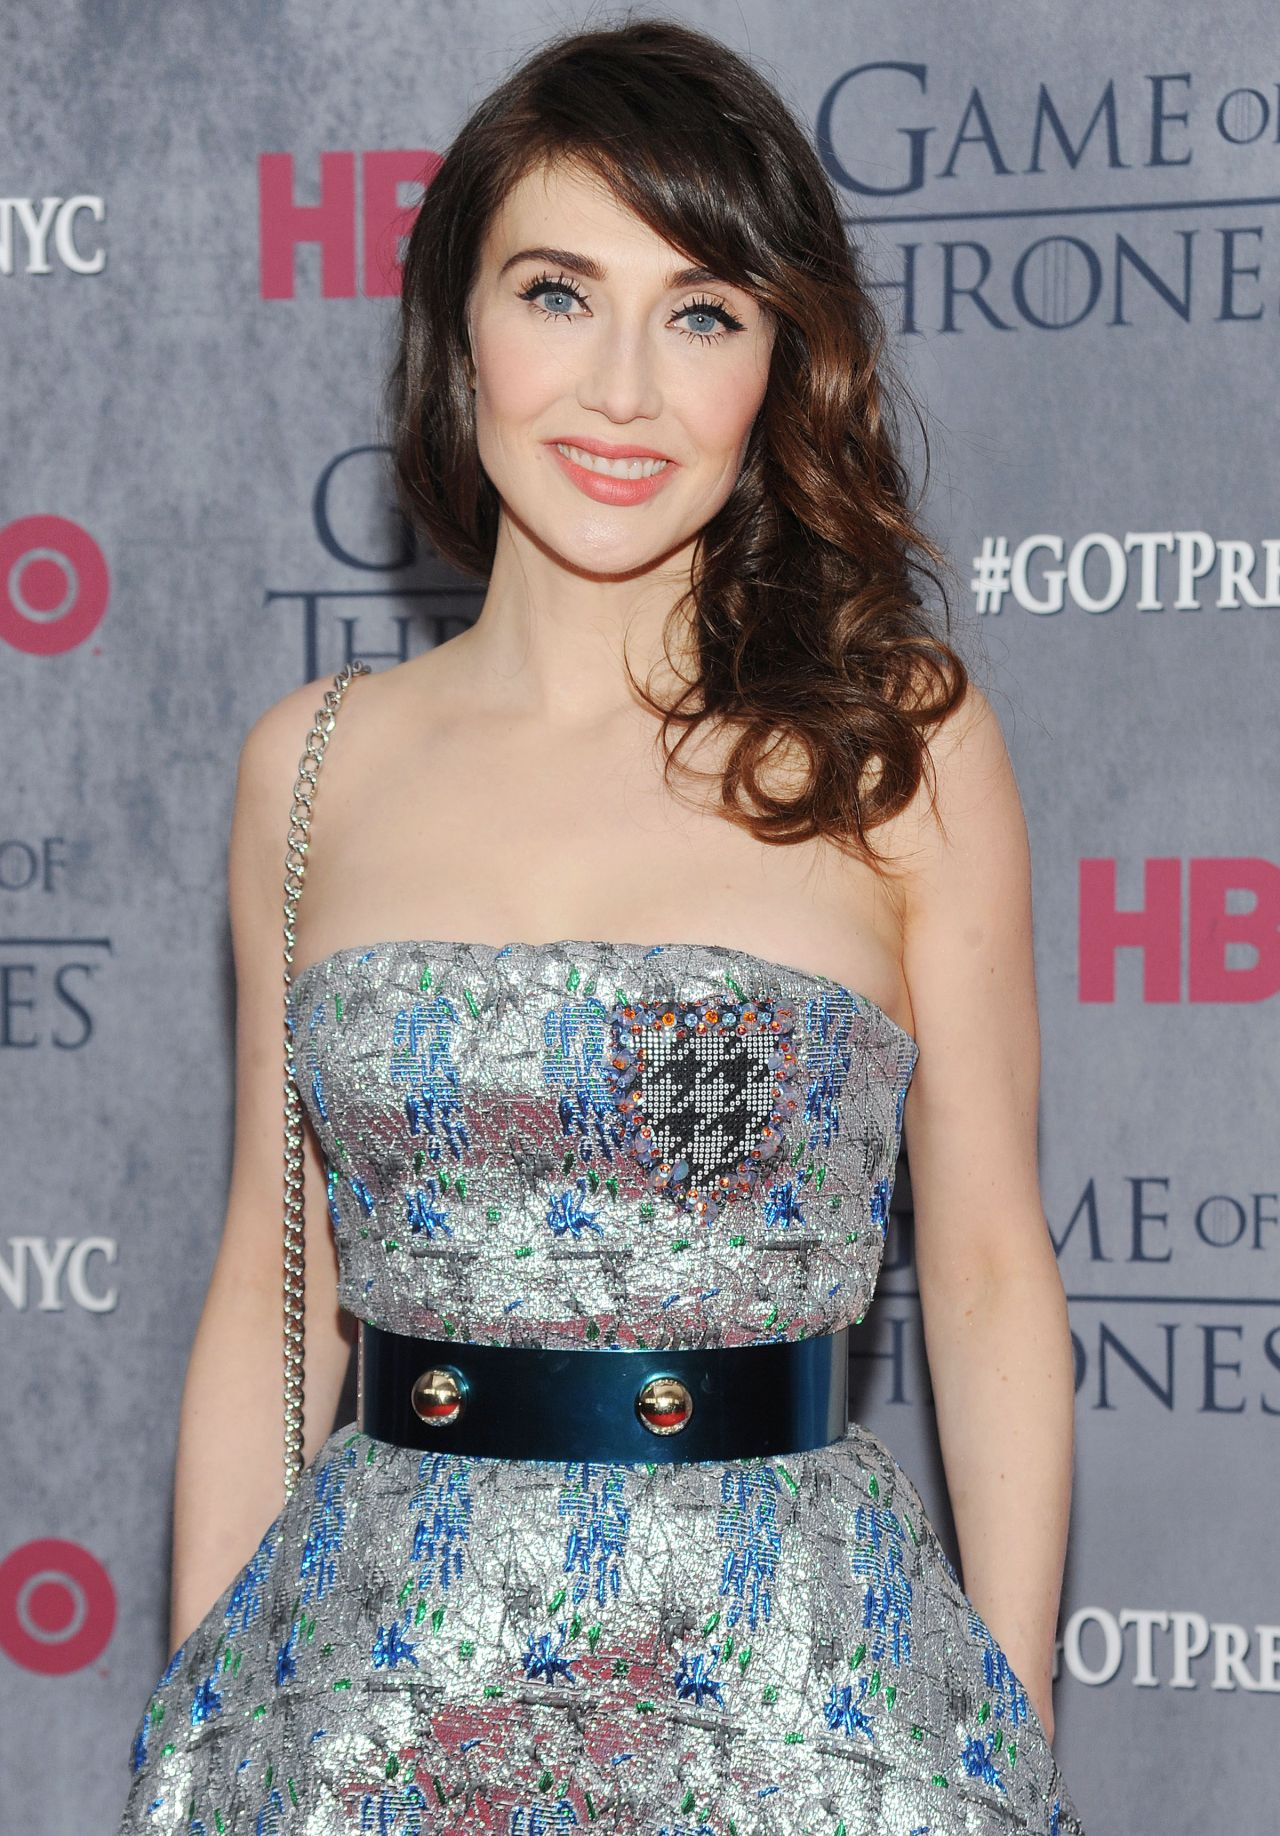 Galerry  van Houten Game of Thrones Season 4 Premiere in New York City 2